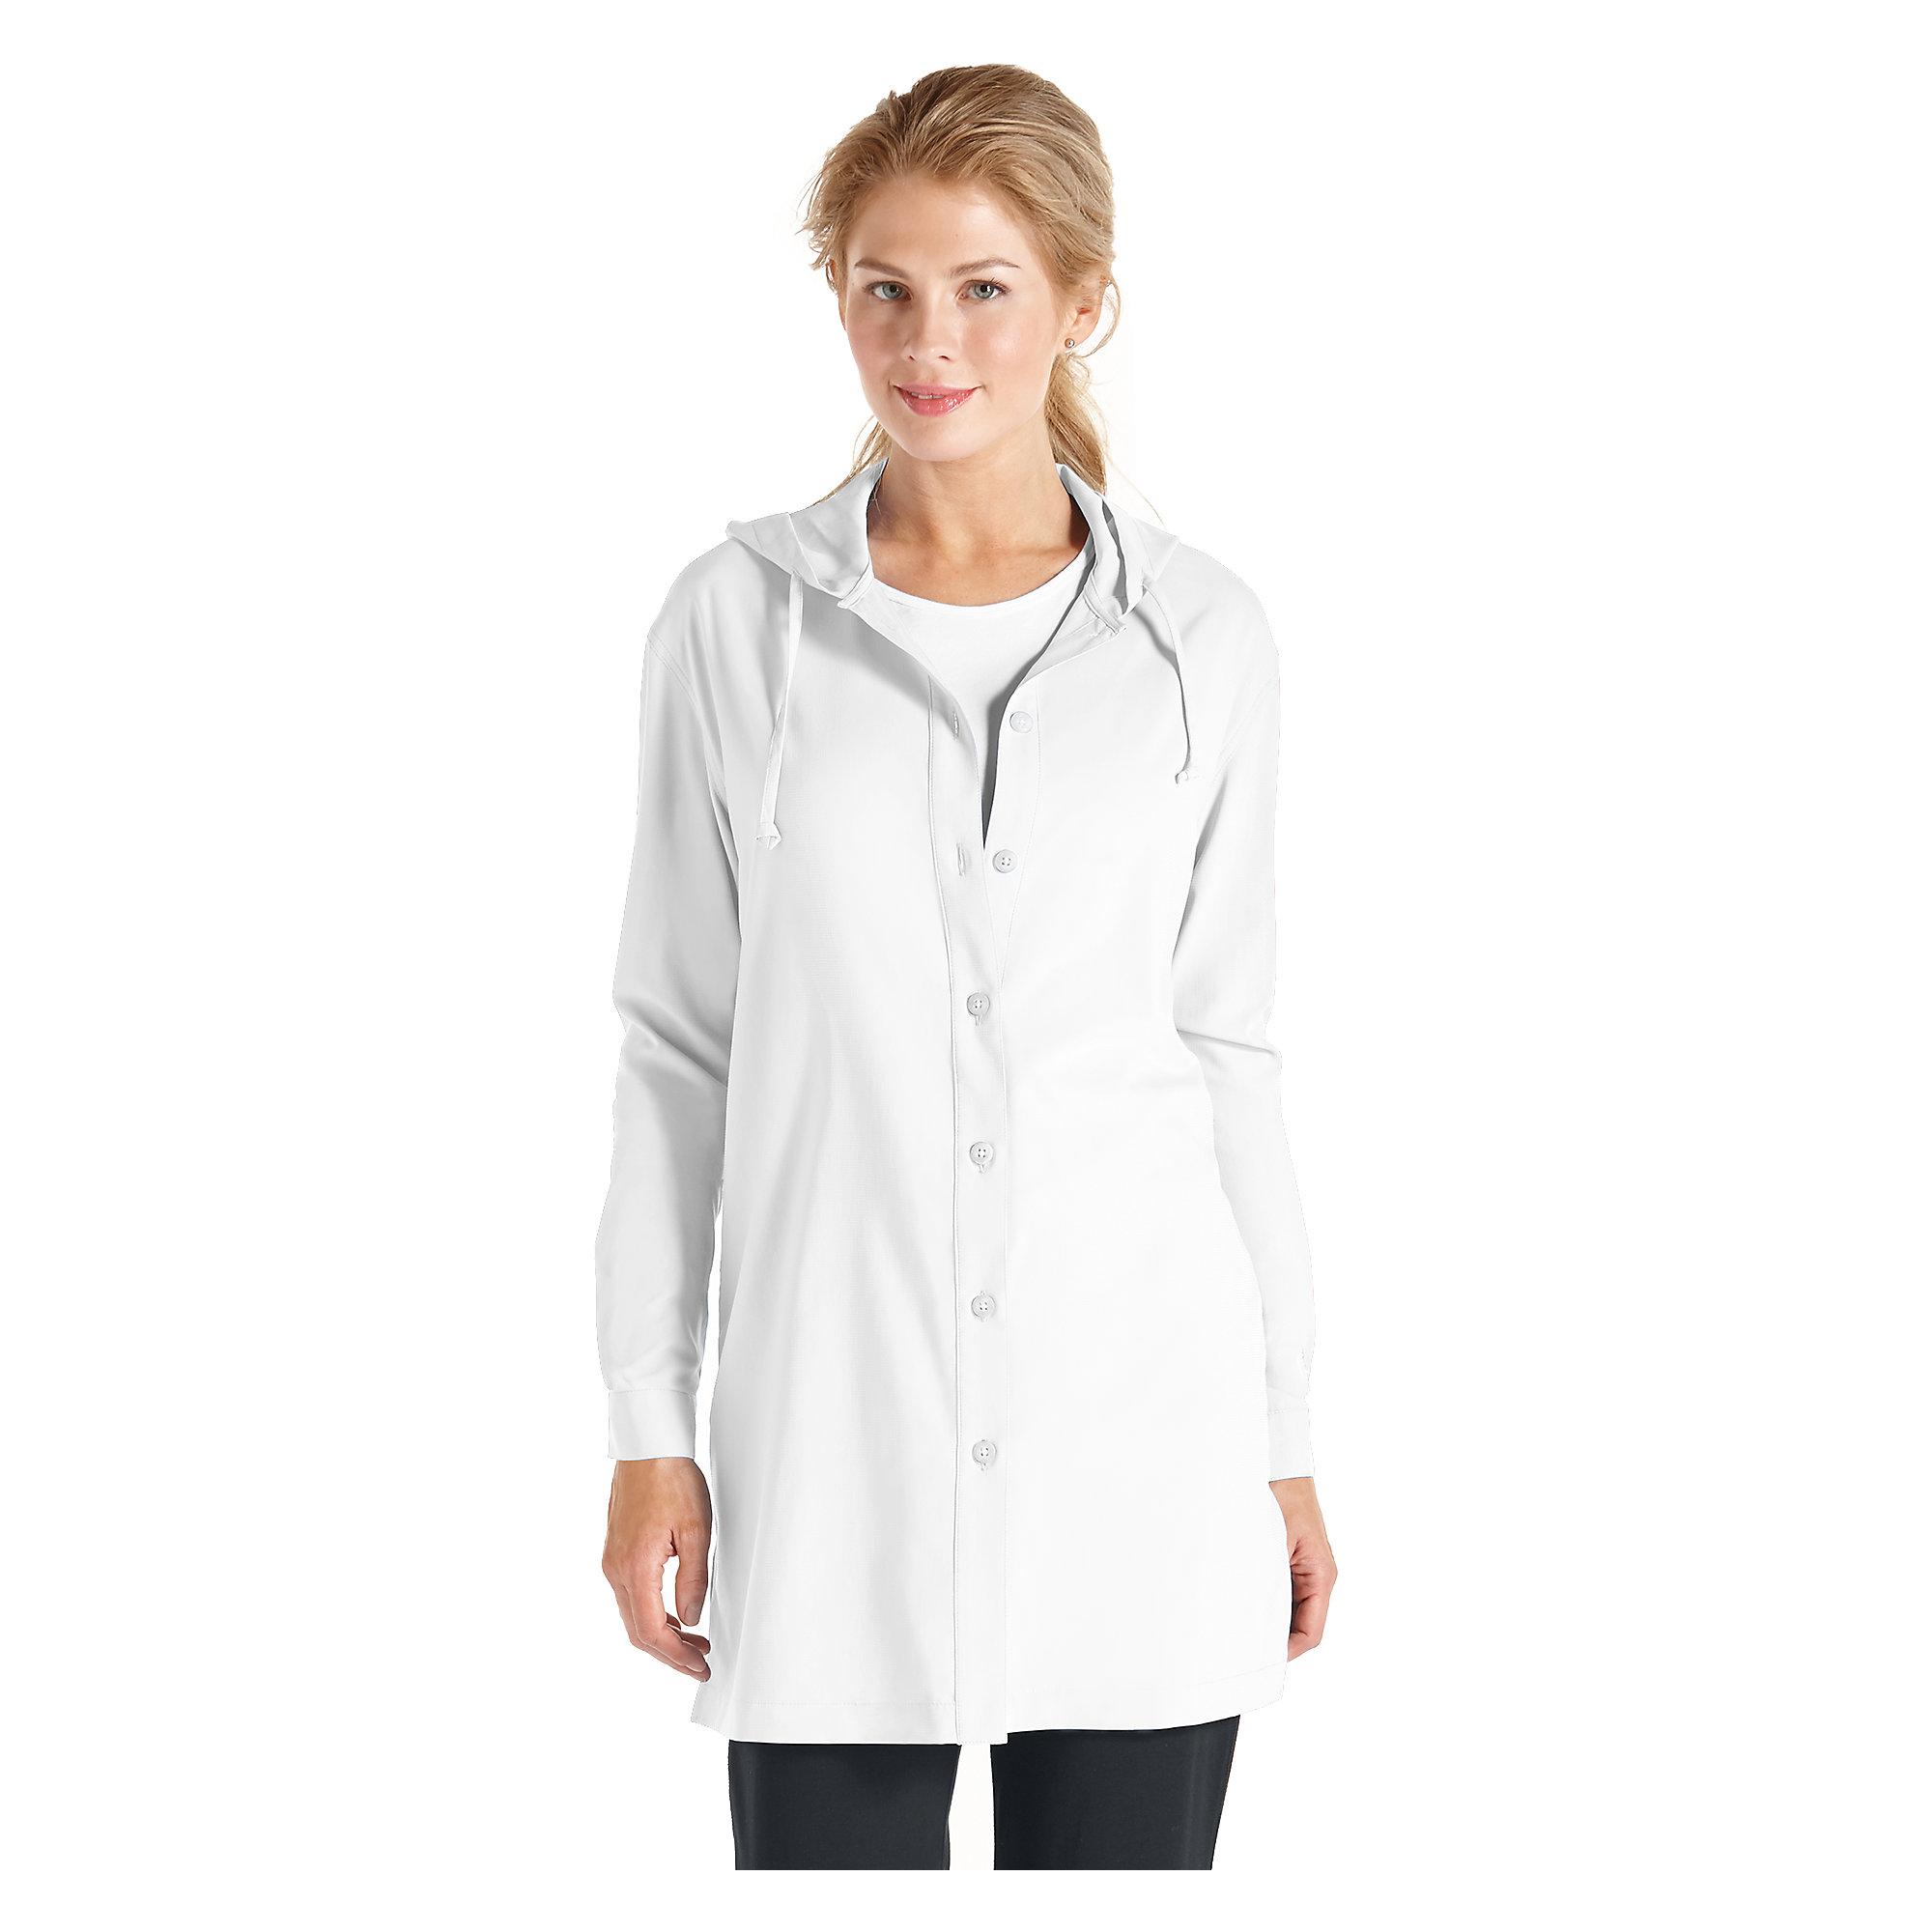 coolibar upf 50 women 39 s beach shirt sun protection ebay